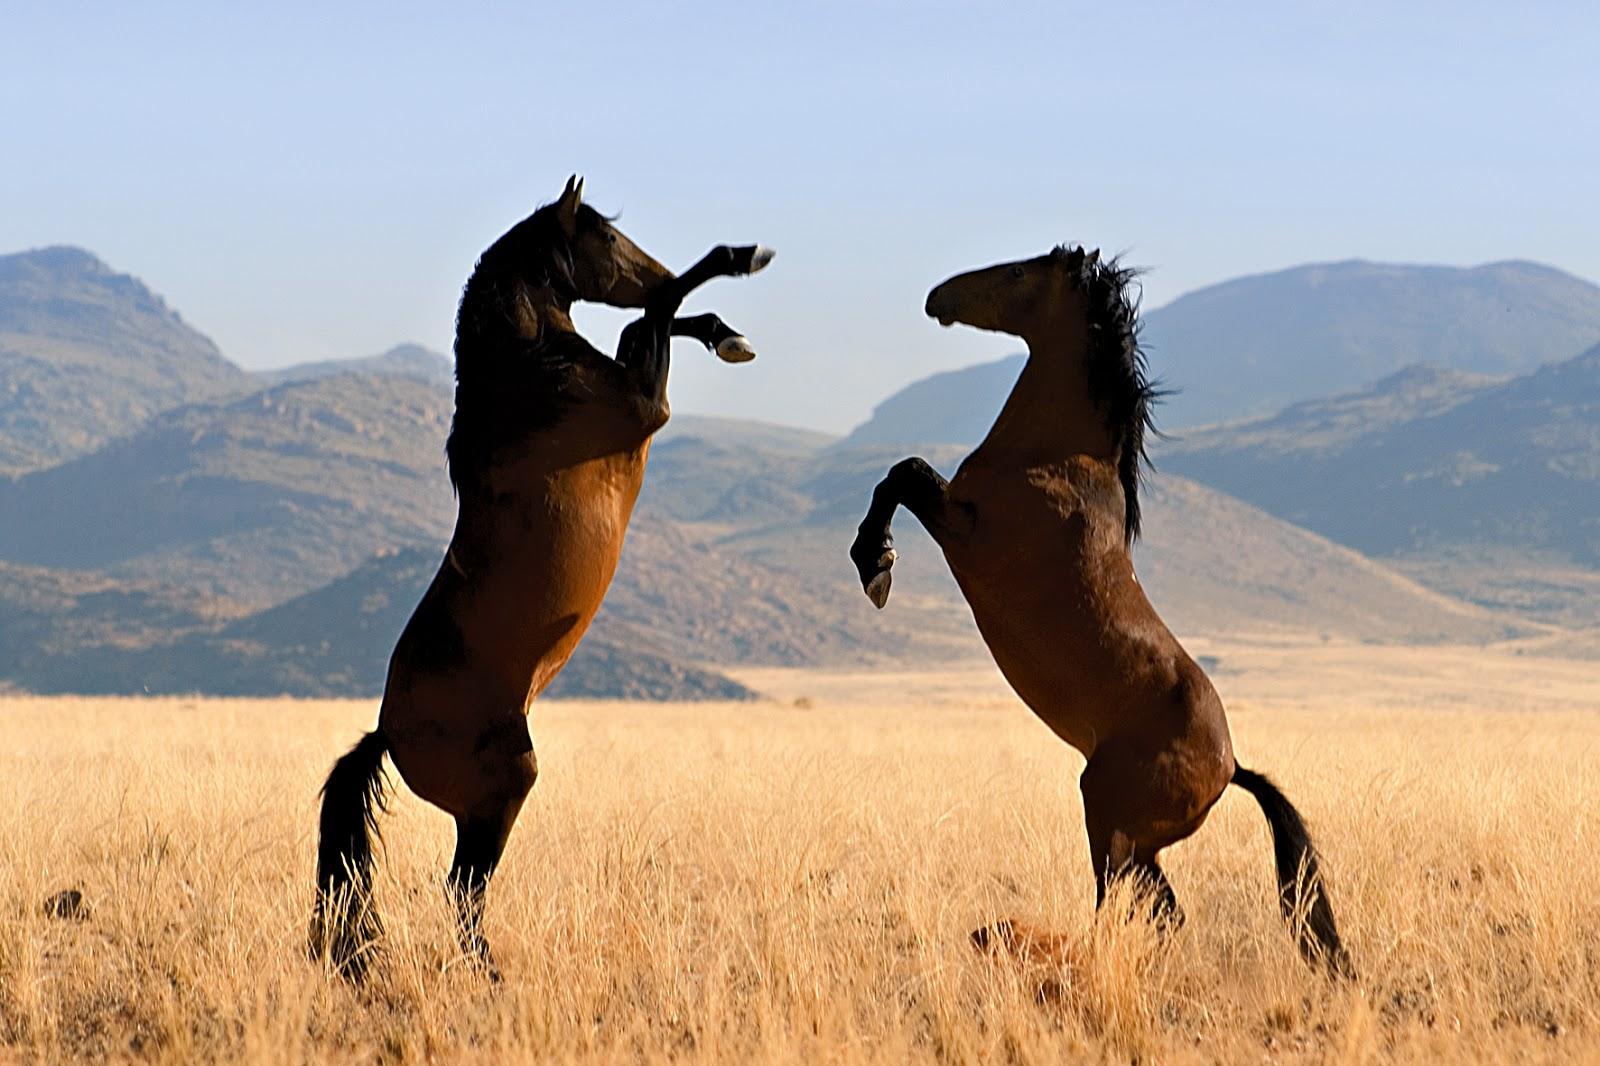 image Ride my wild horse whore big long cock dick